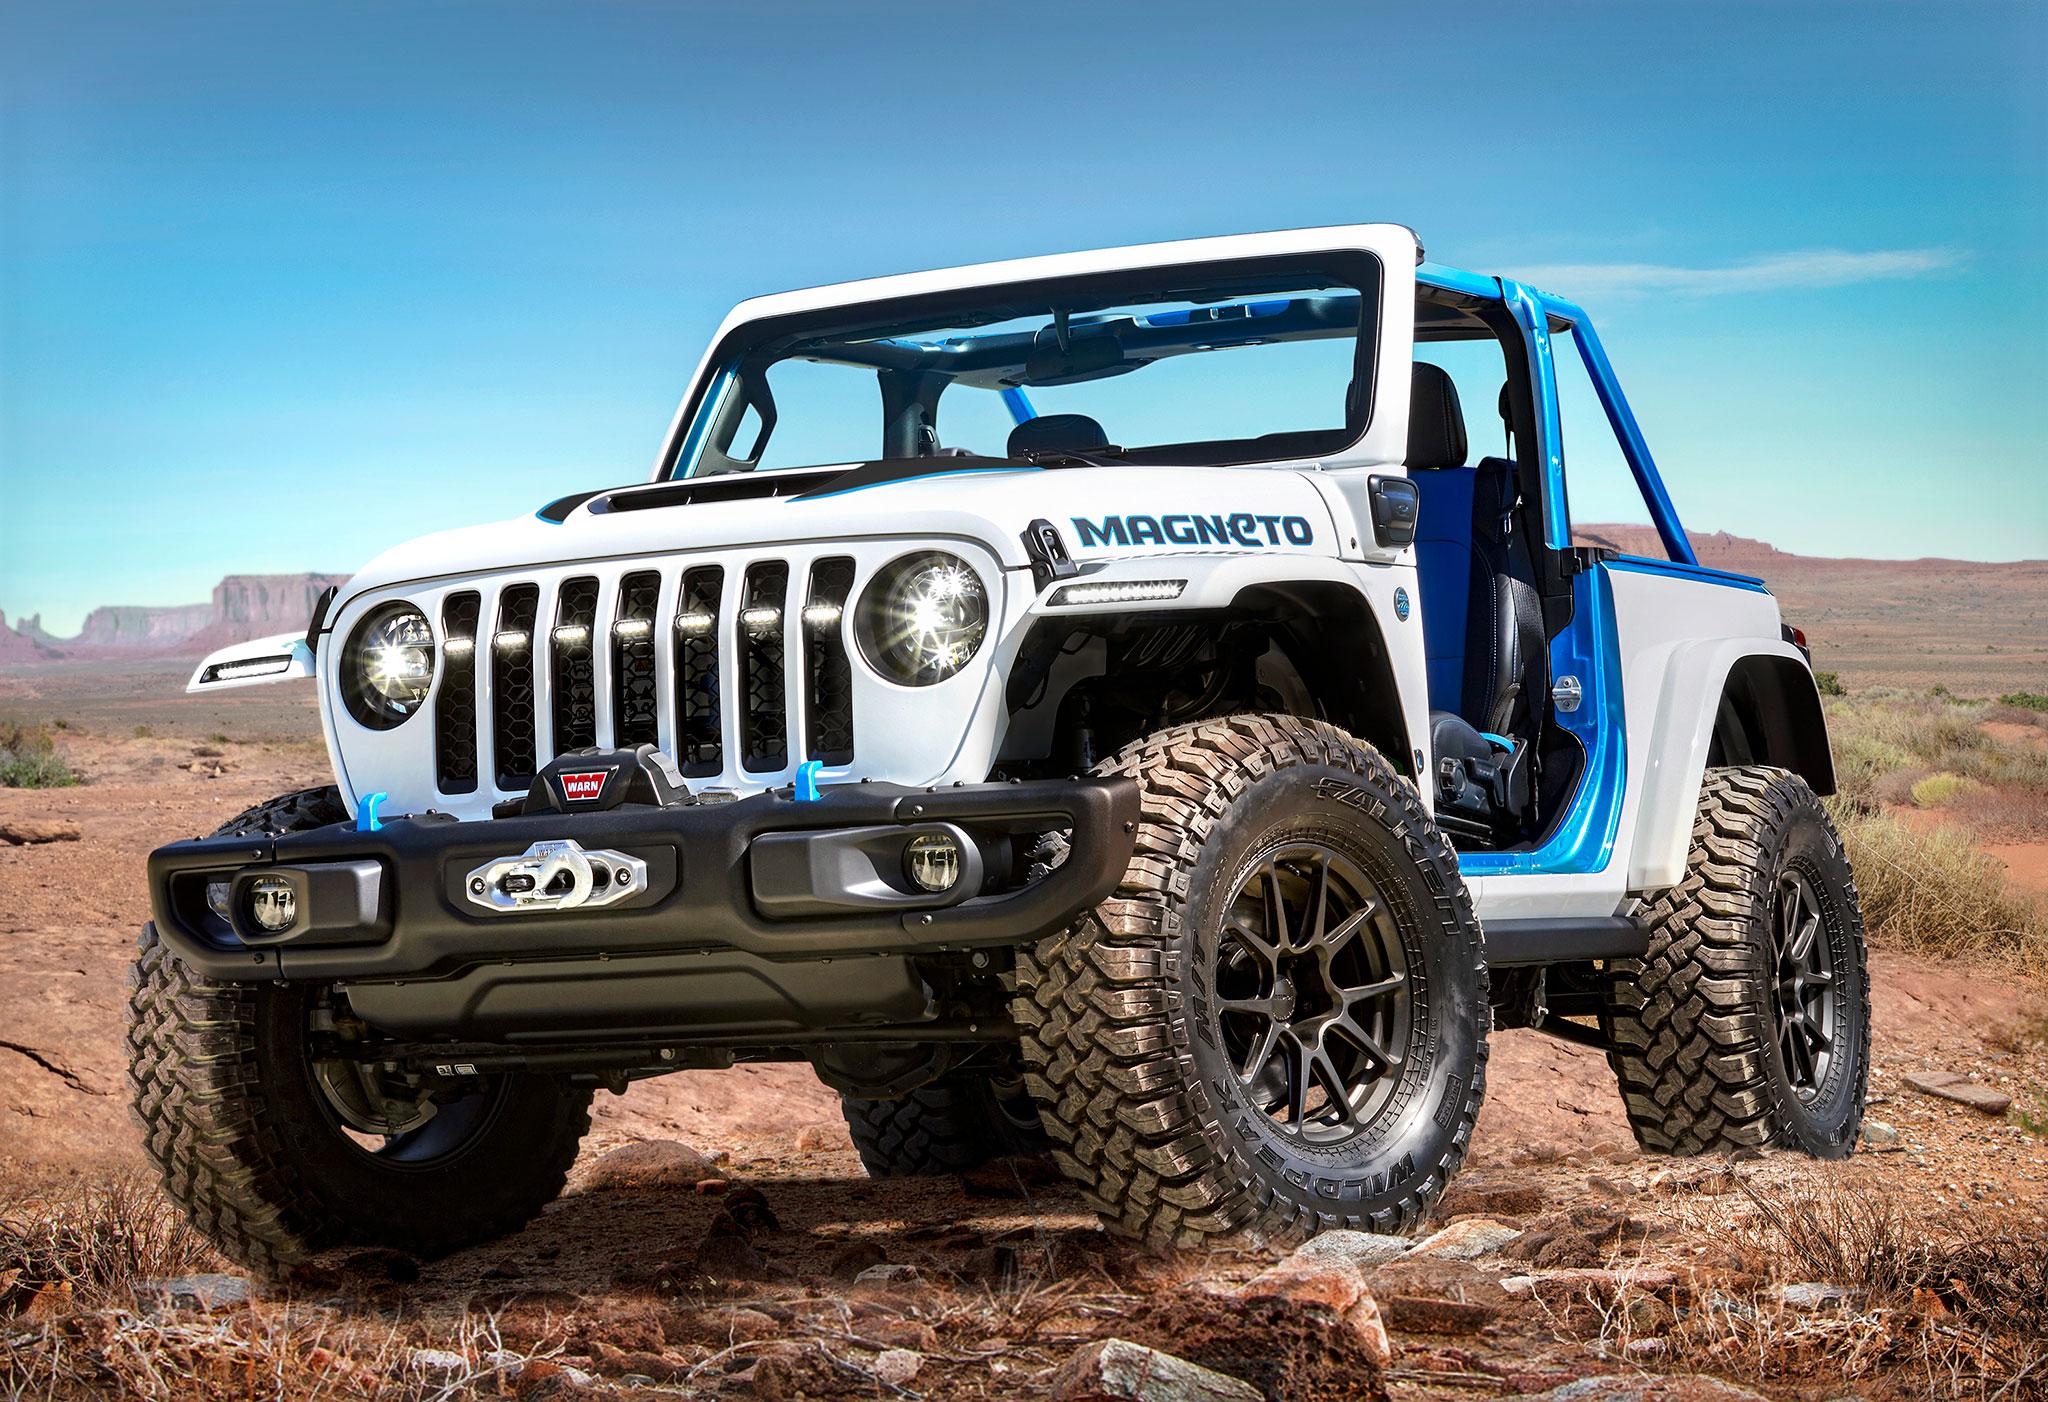 2021 Jeep Wrangler Magneto Concept trois quarta avant gauche - Concept Cars de Jeep®.